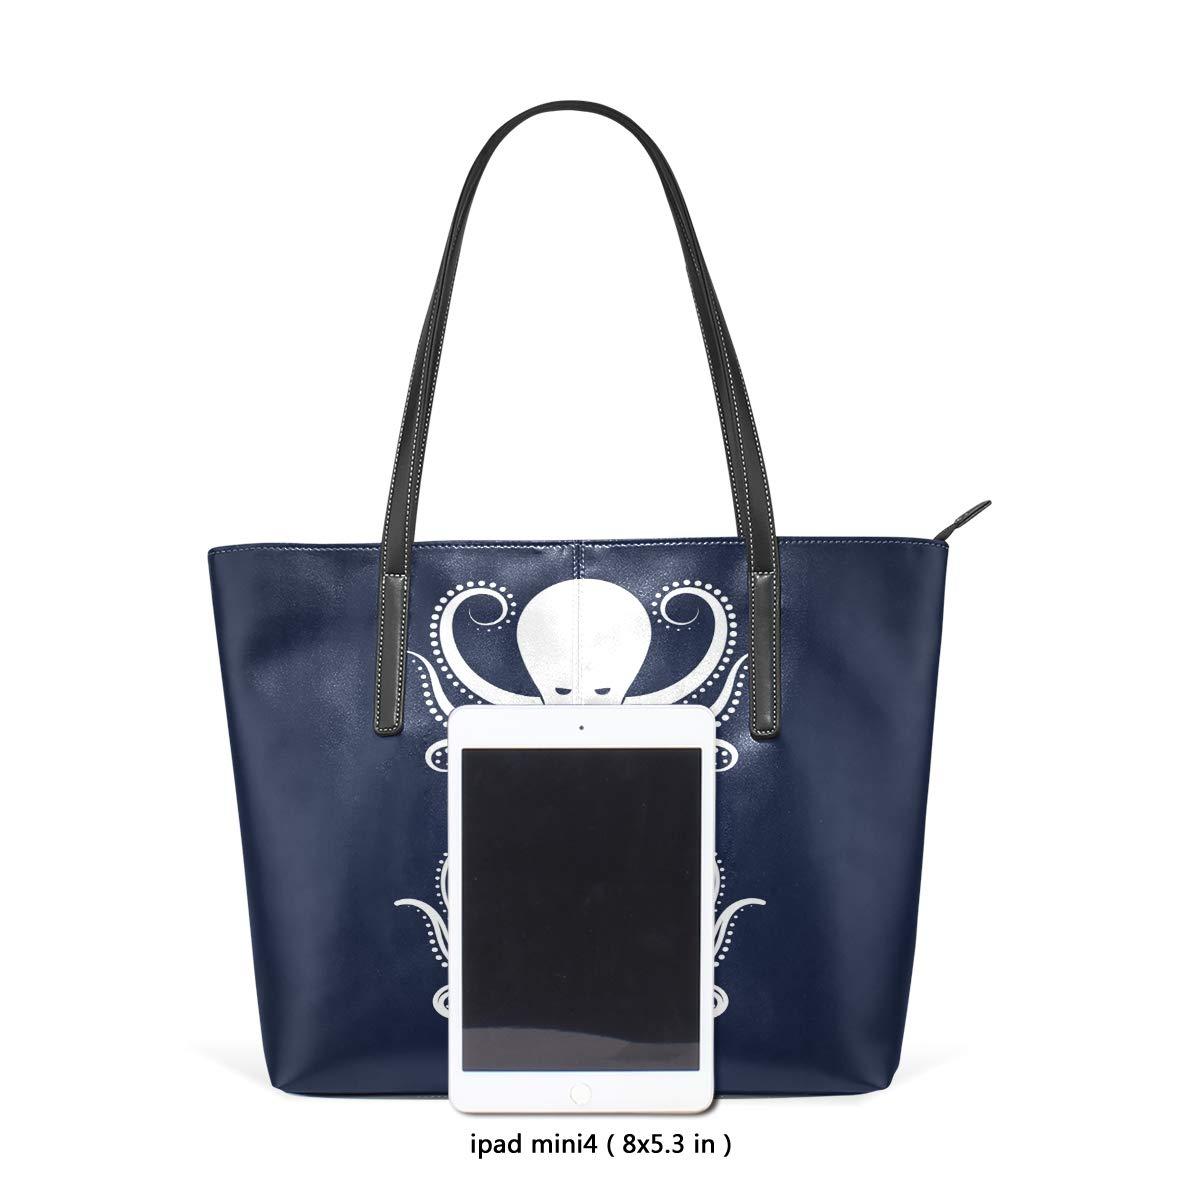 Islamic Vintage Tribal Womens PU Leather Tote Shoulder Bags Handbags Casual Bag